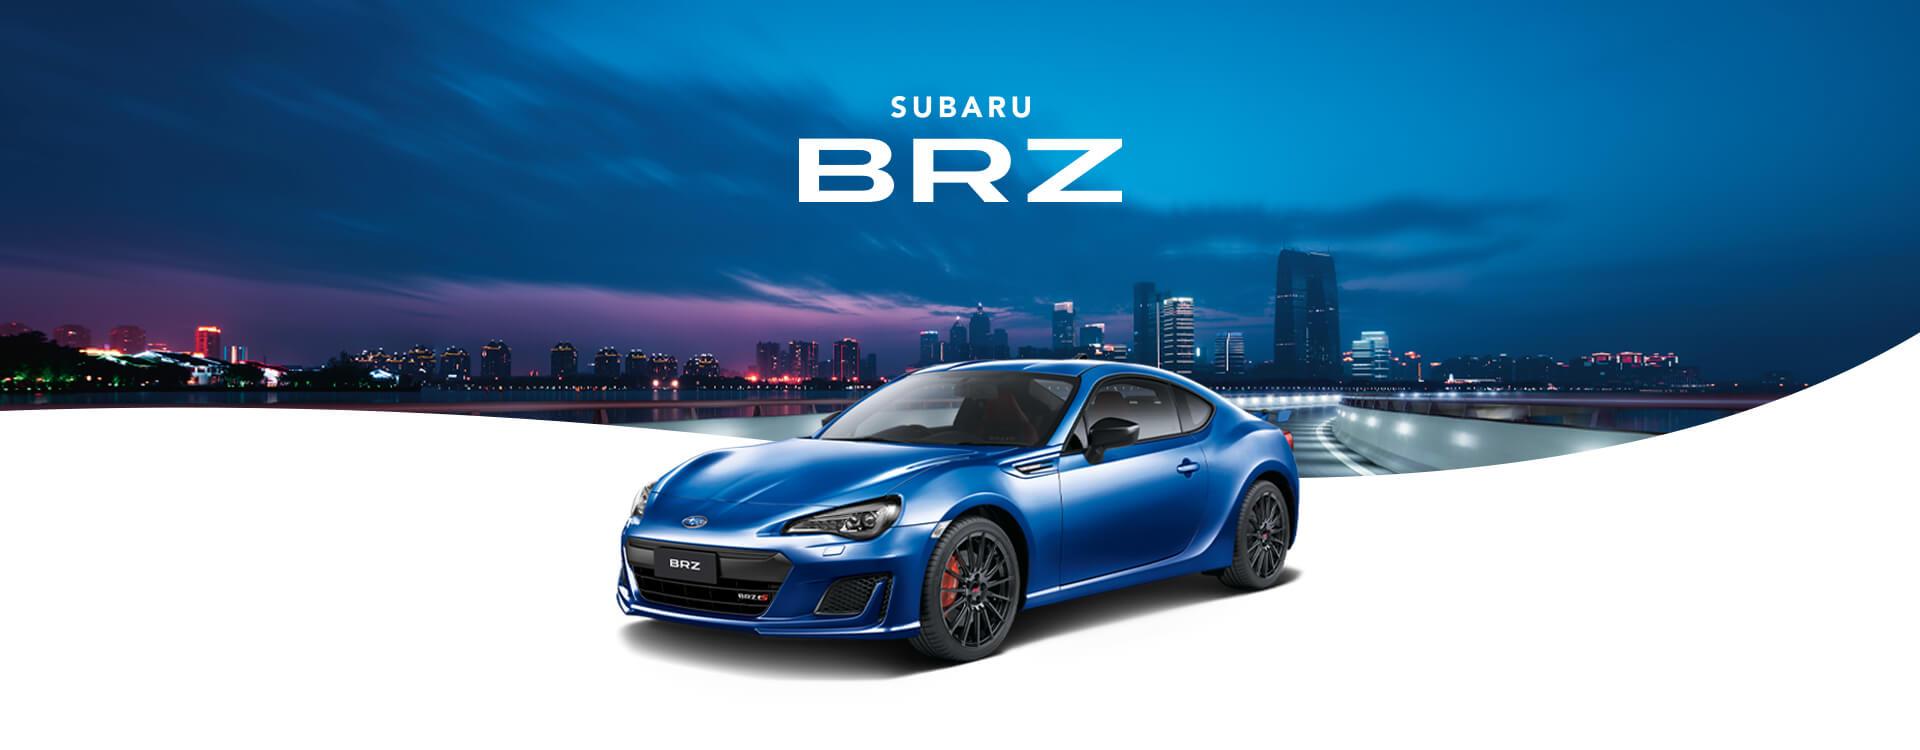 Subaru BRZ Picture